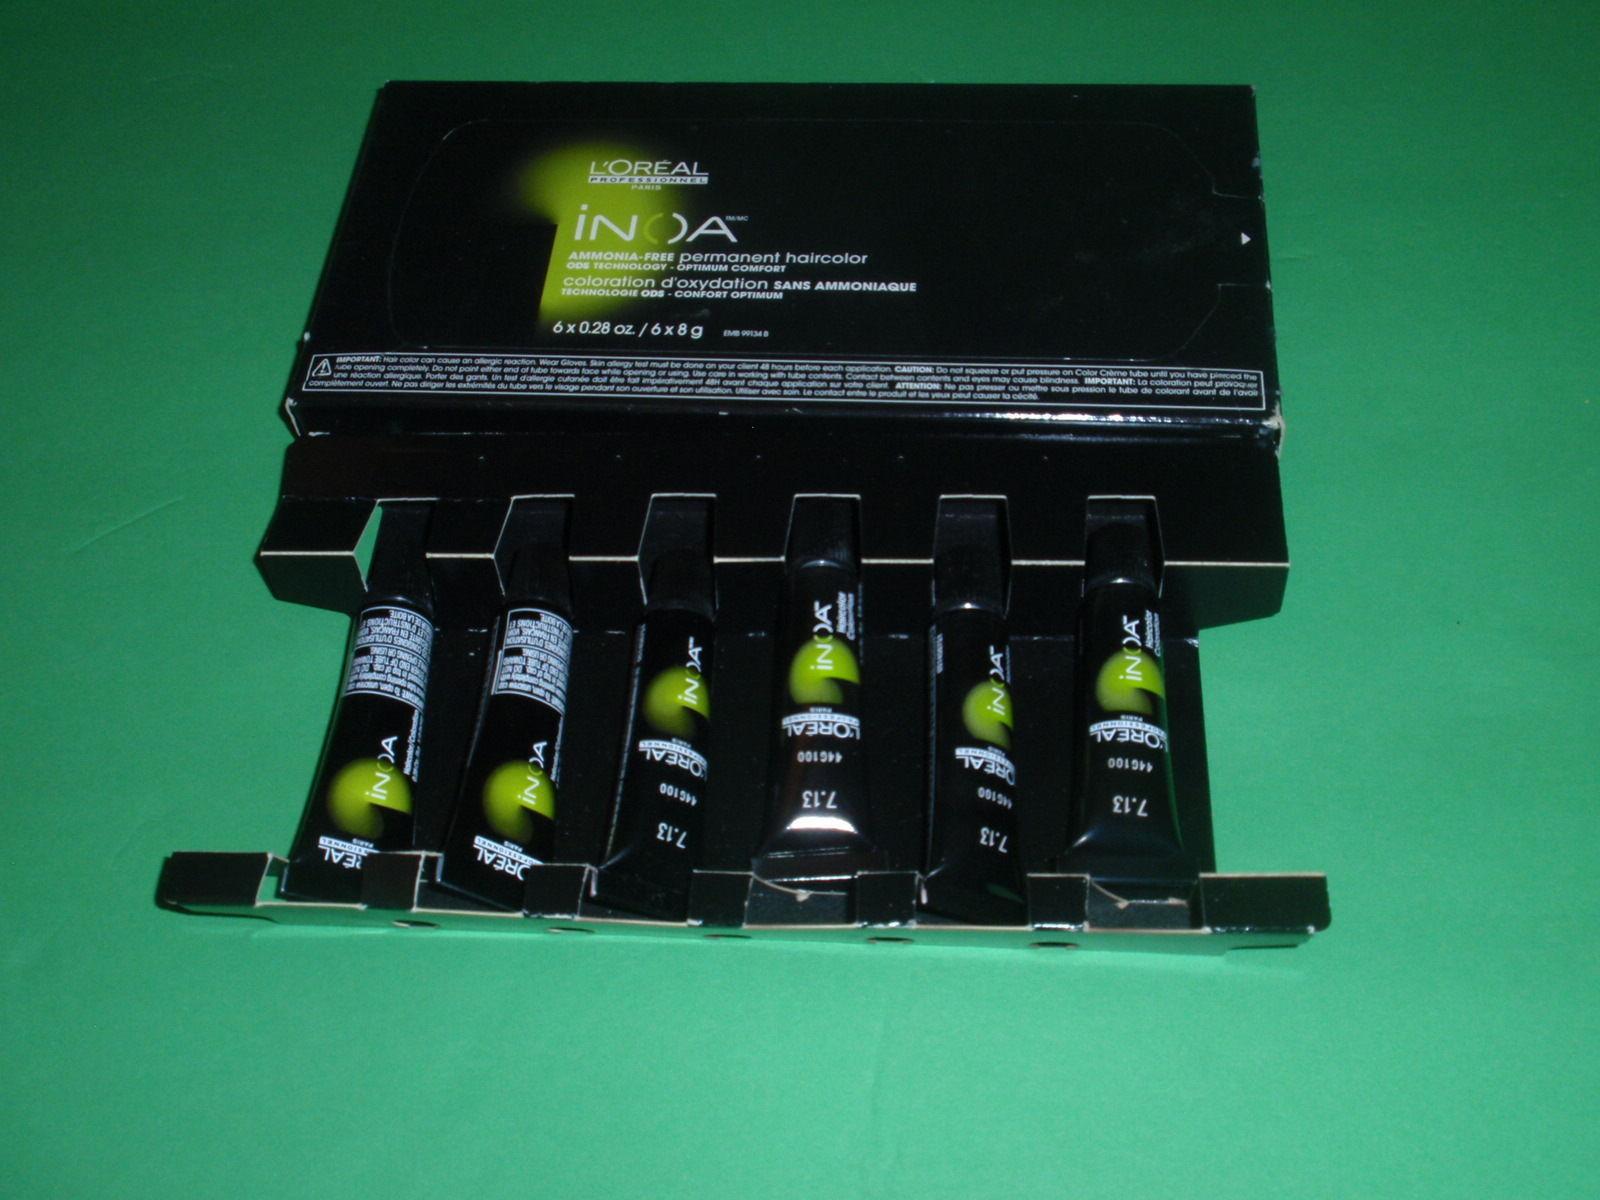 Loreal Inoa Hair Color 6 X0.28 Oz 3/3 N and 50 similar items